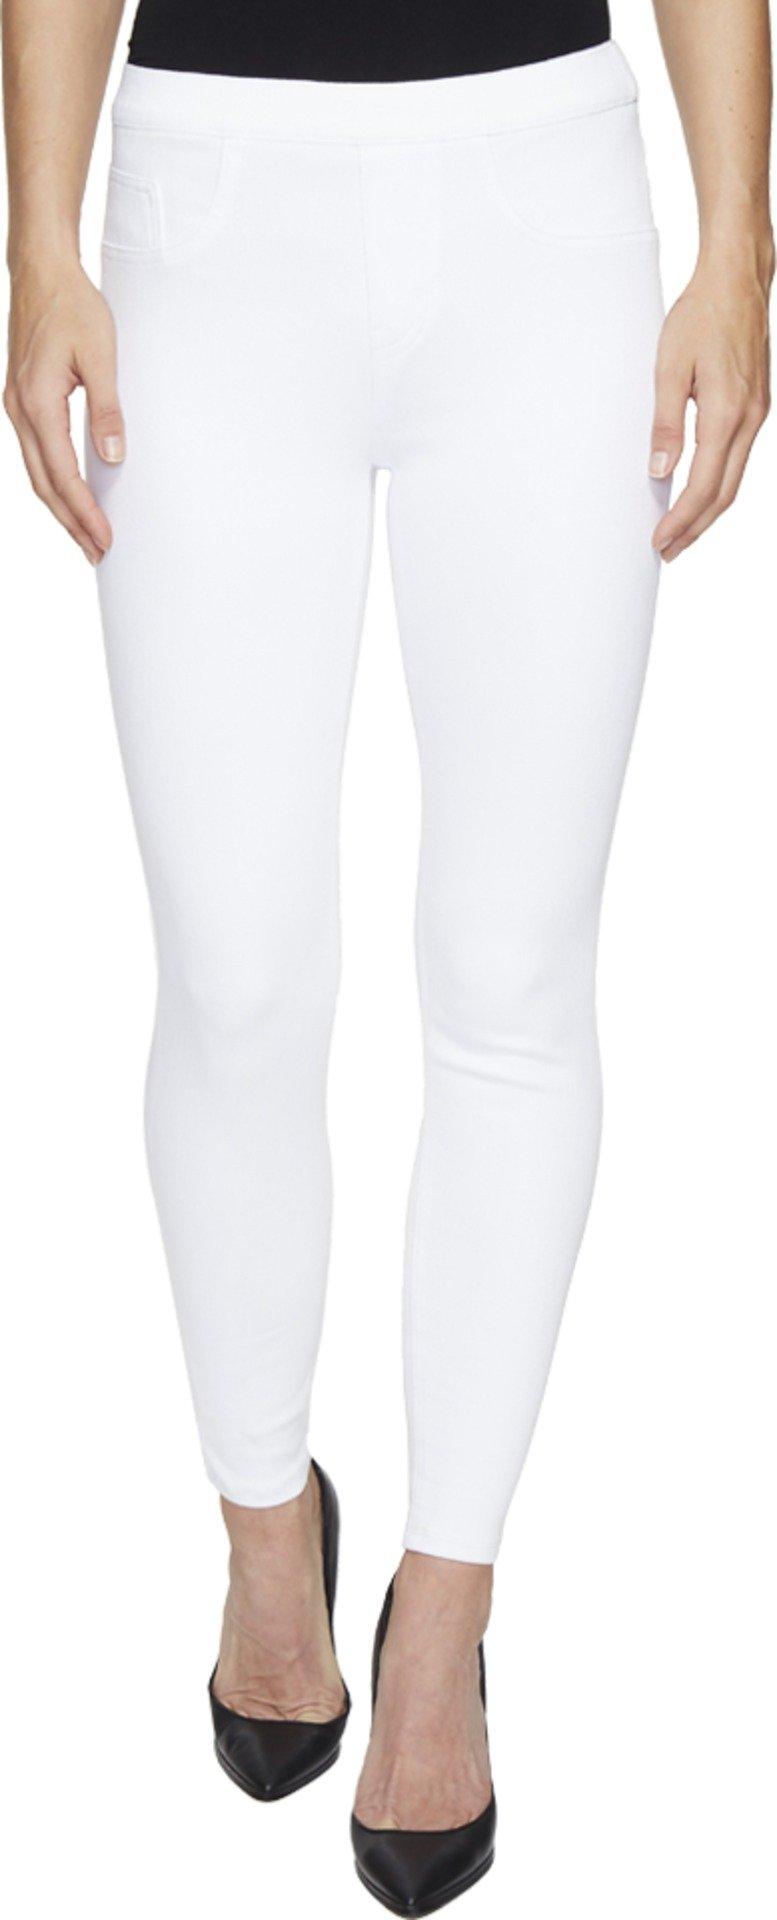 SPANX Cropped Denim Leggings, S, White